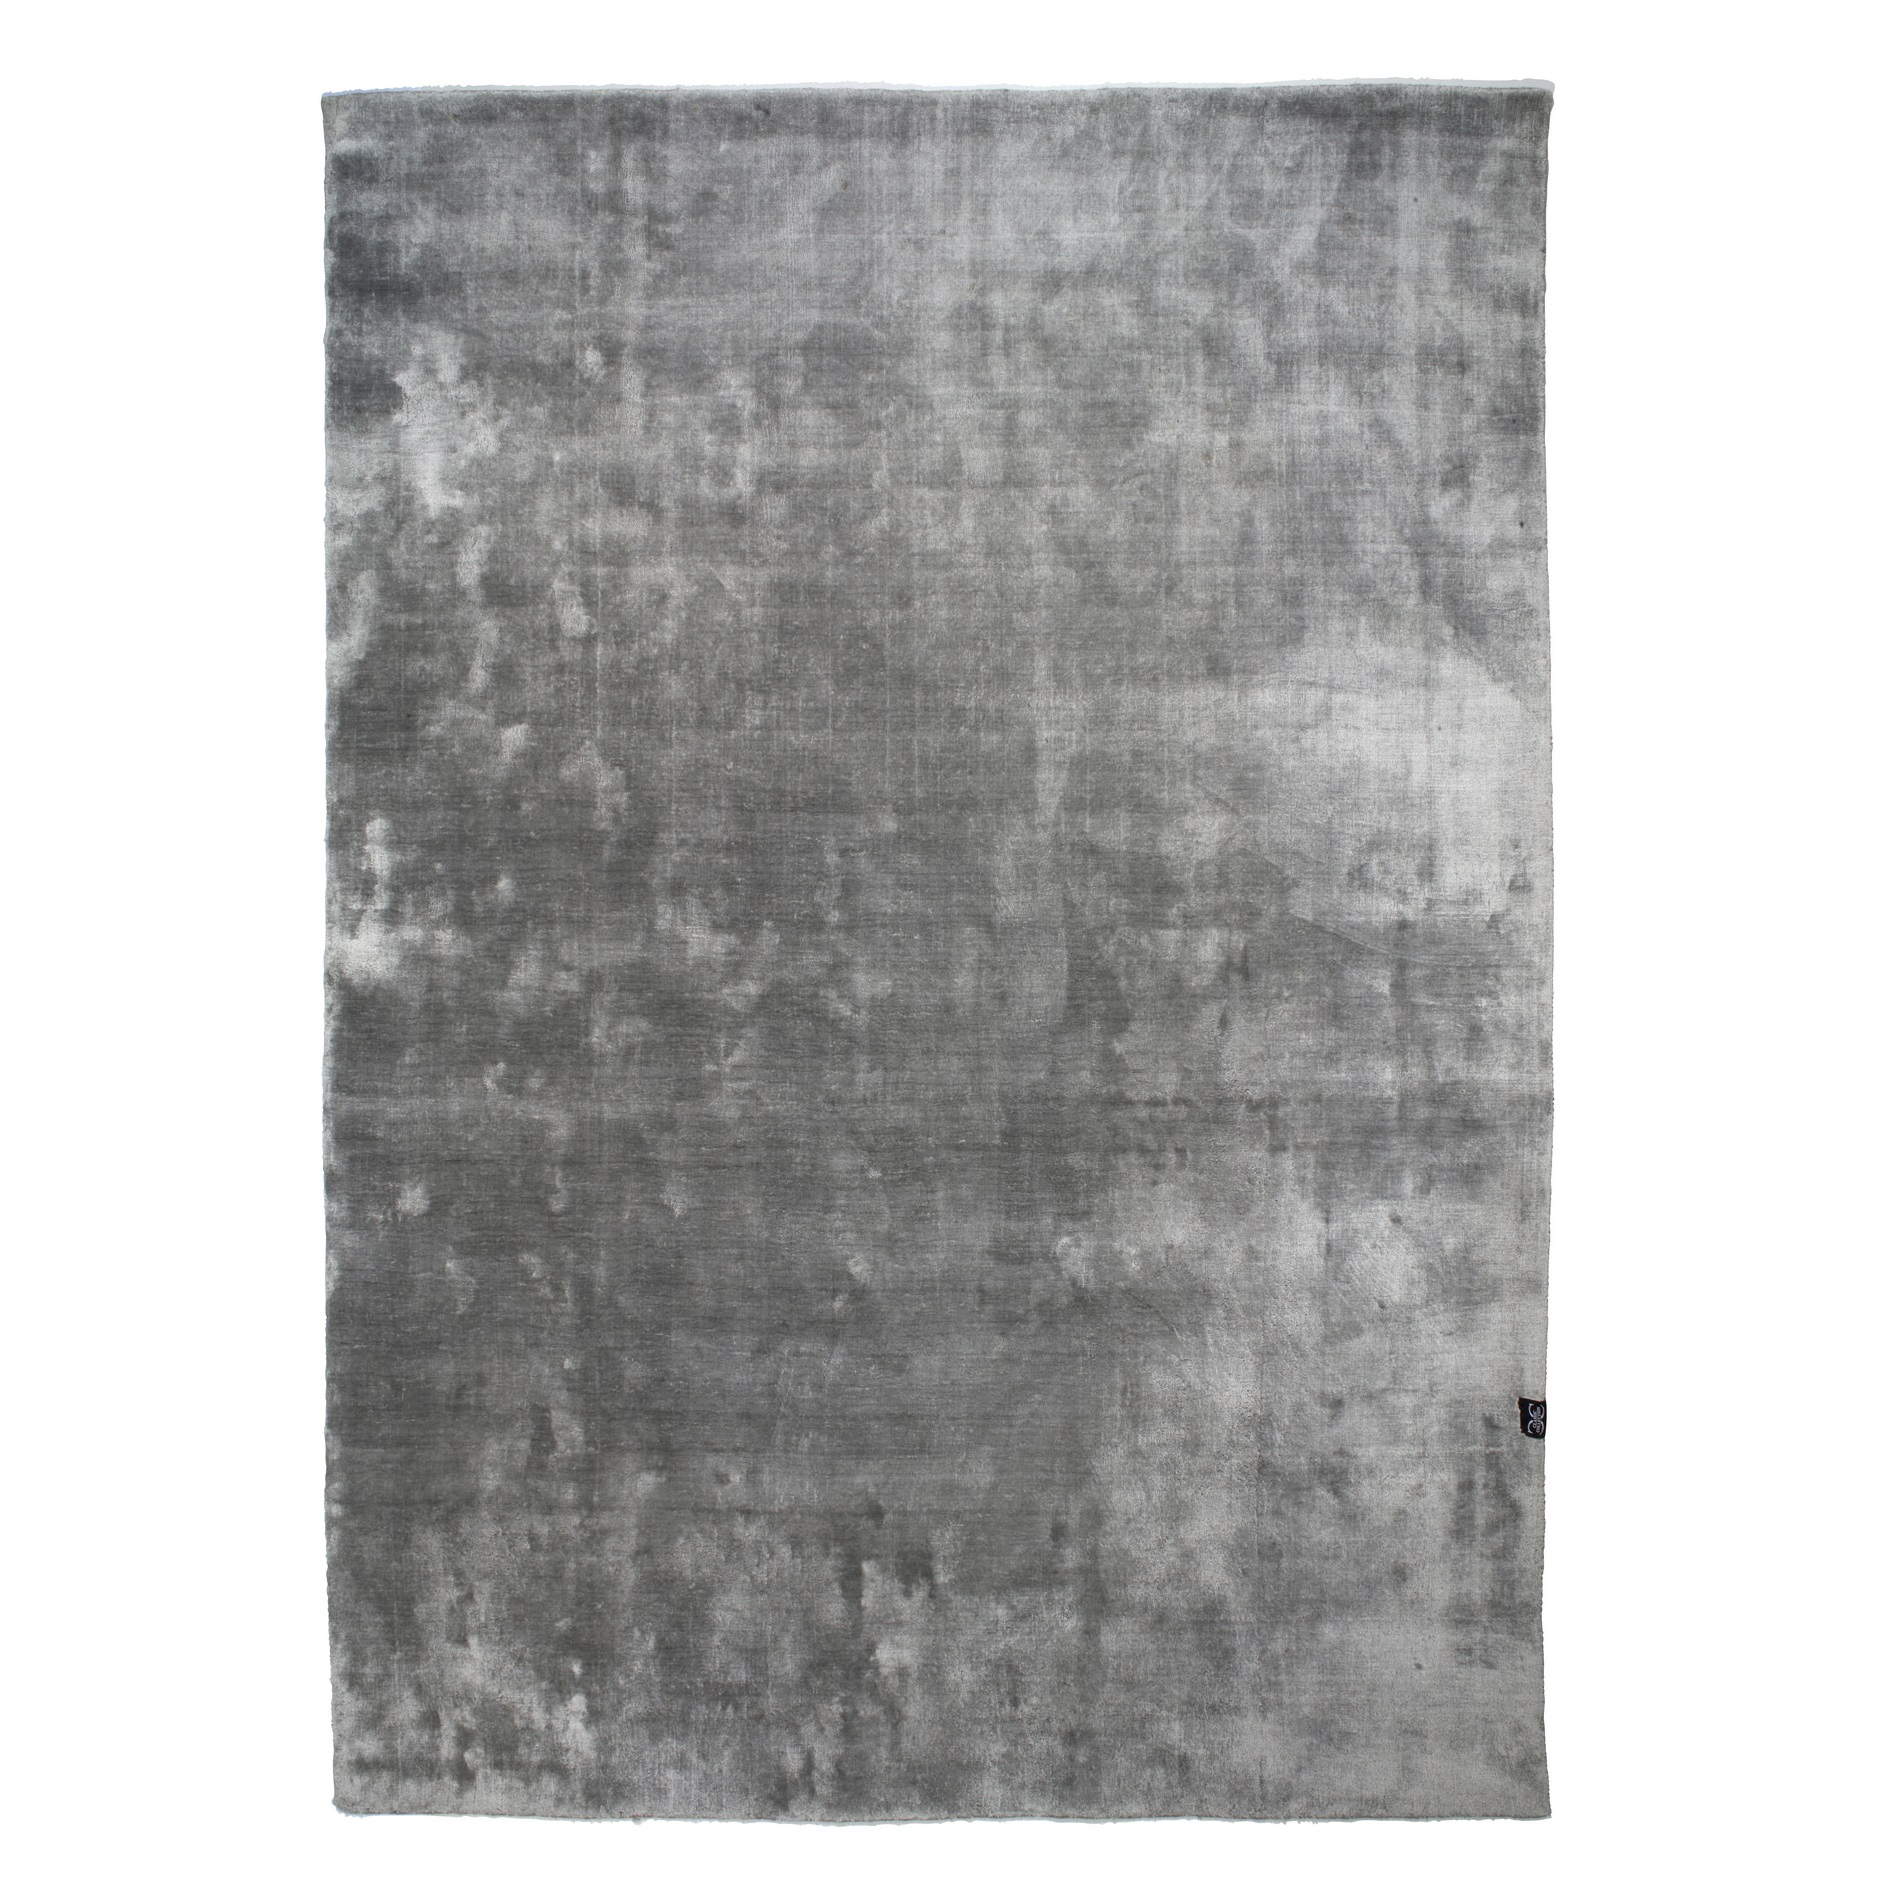 Viskosmatta VELVET TENCEL silver 200 x 300 cm, Classic Collection